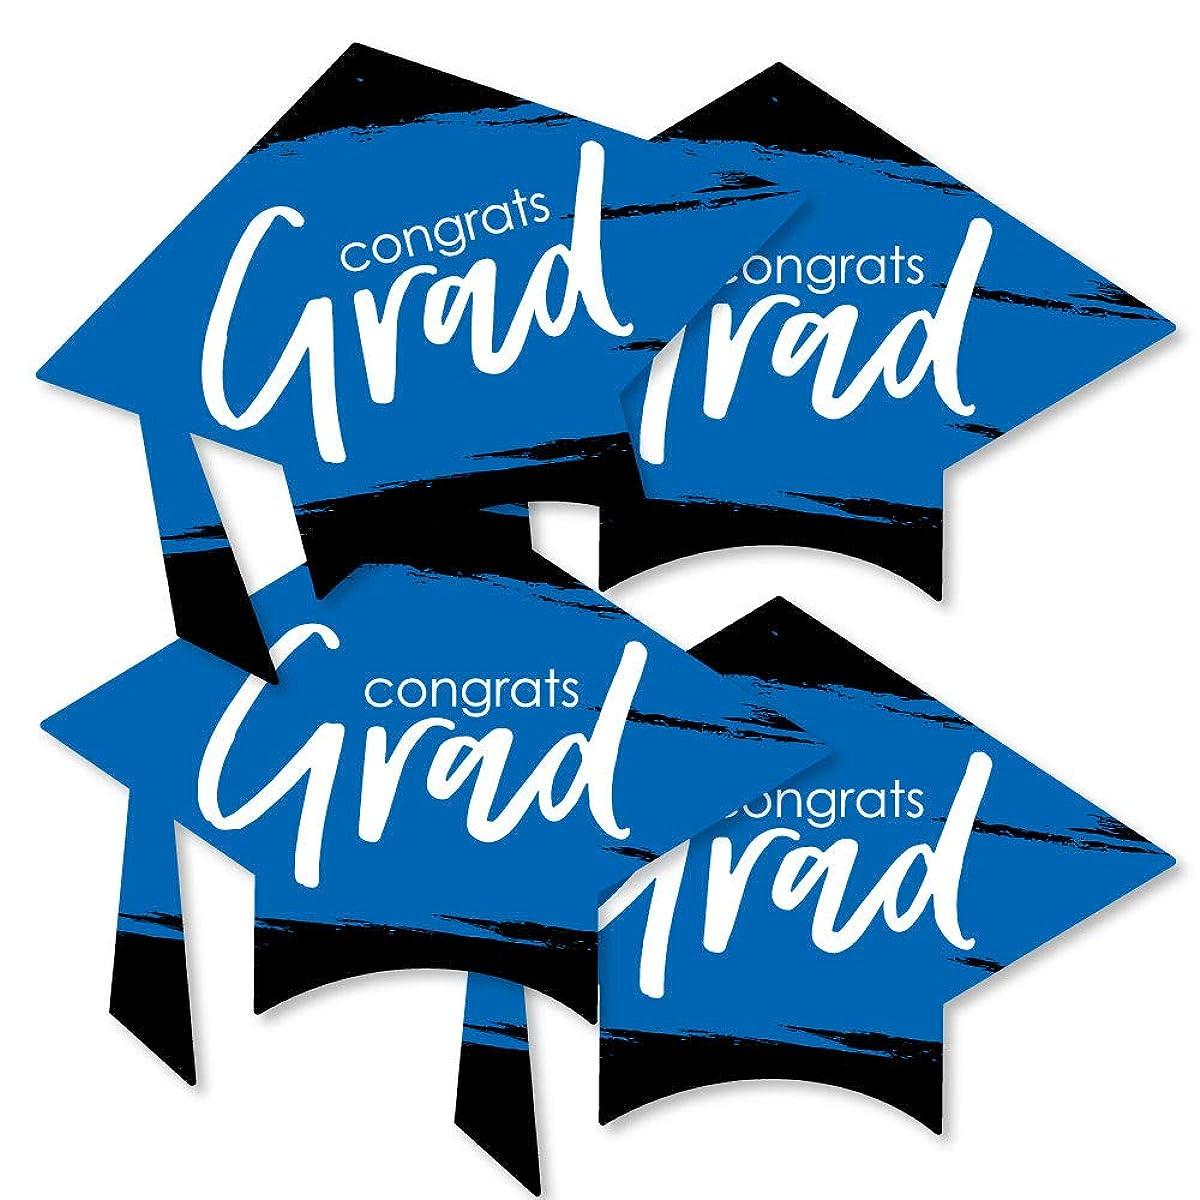 Blue Grad - Best is Yet to Come - Grad Cap Decorations DIY Royal Blue Graduation Party Essentials - Set of 20